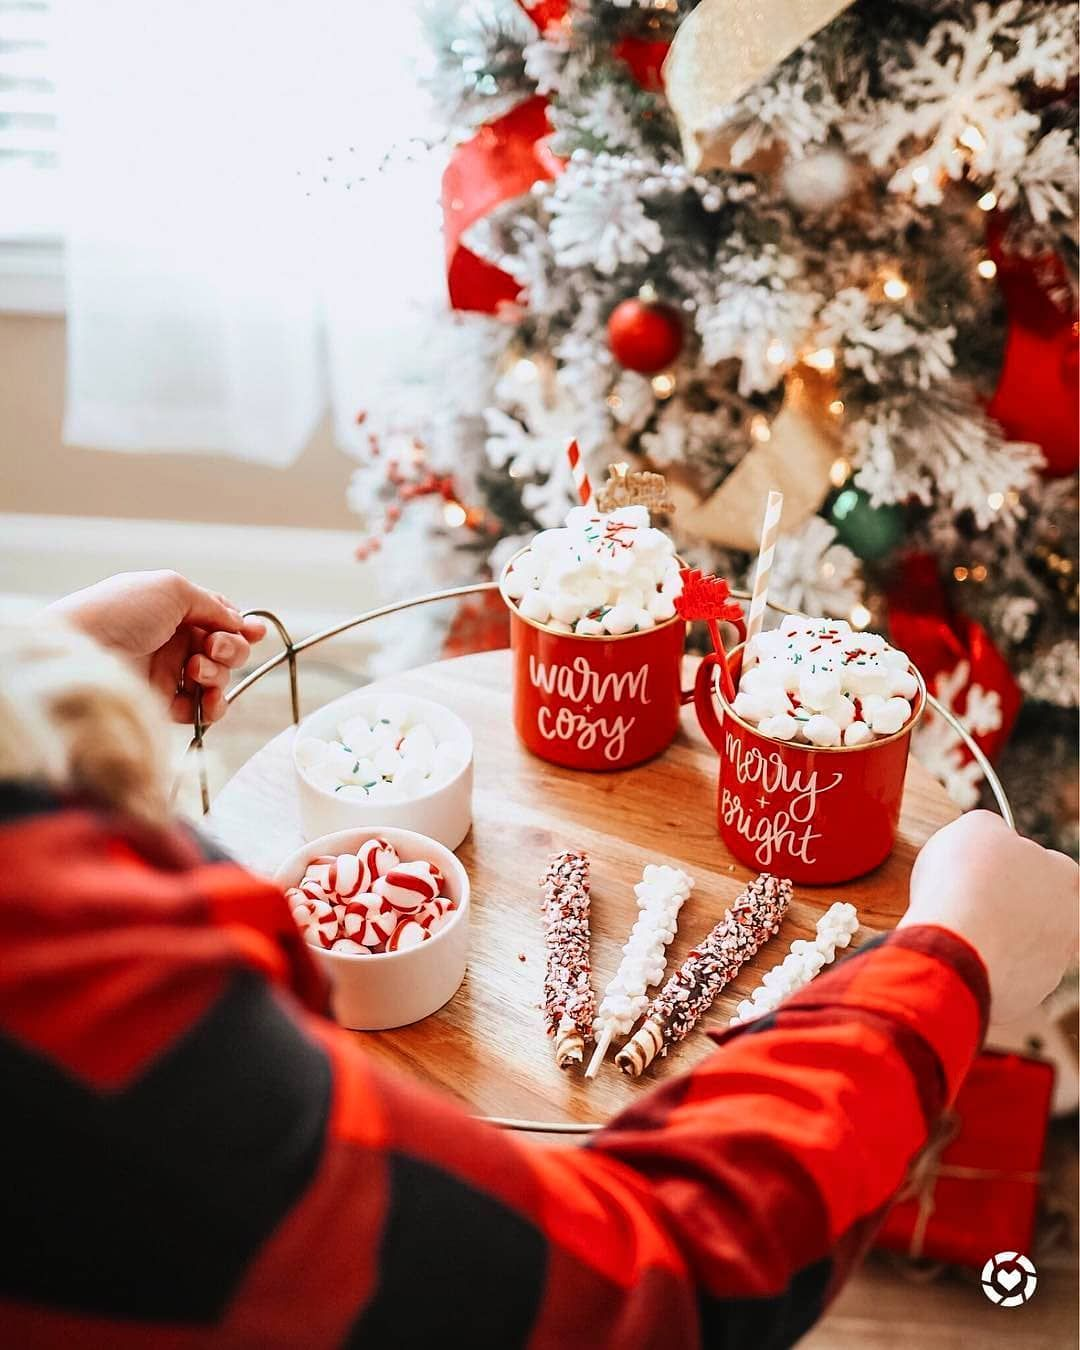 41 days 'til Christmas day __ Where will you be spending